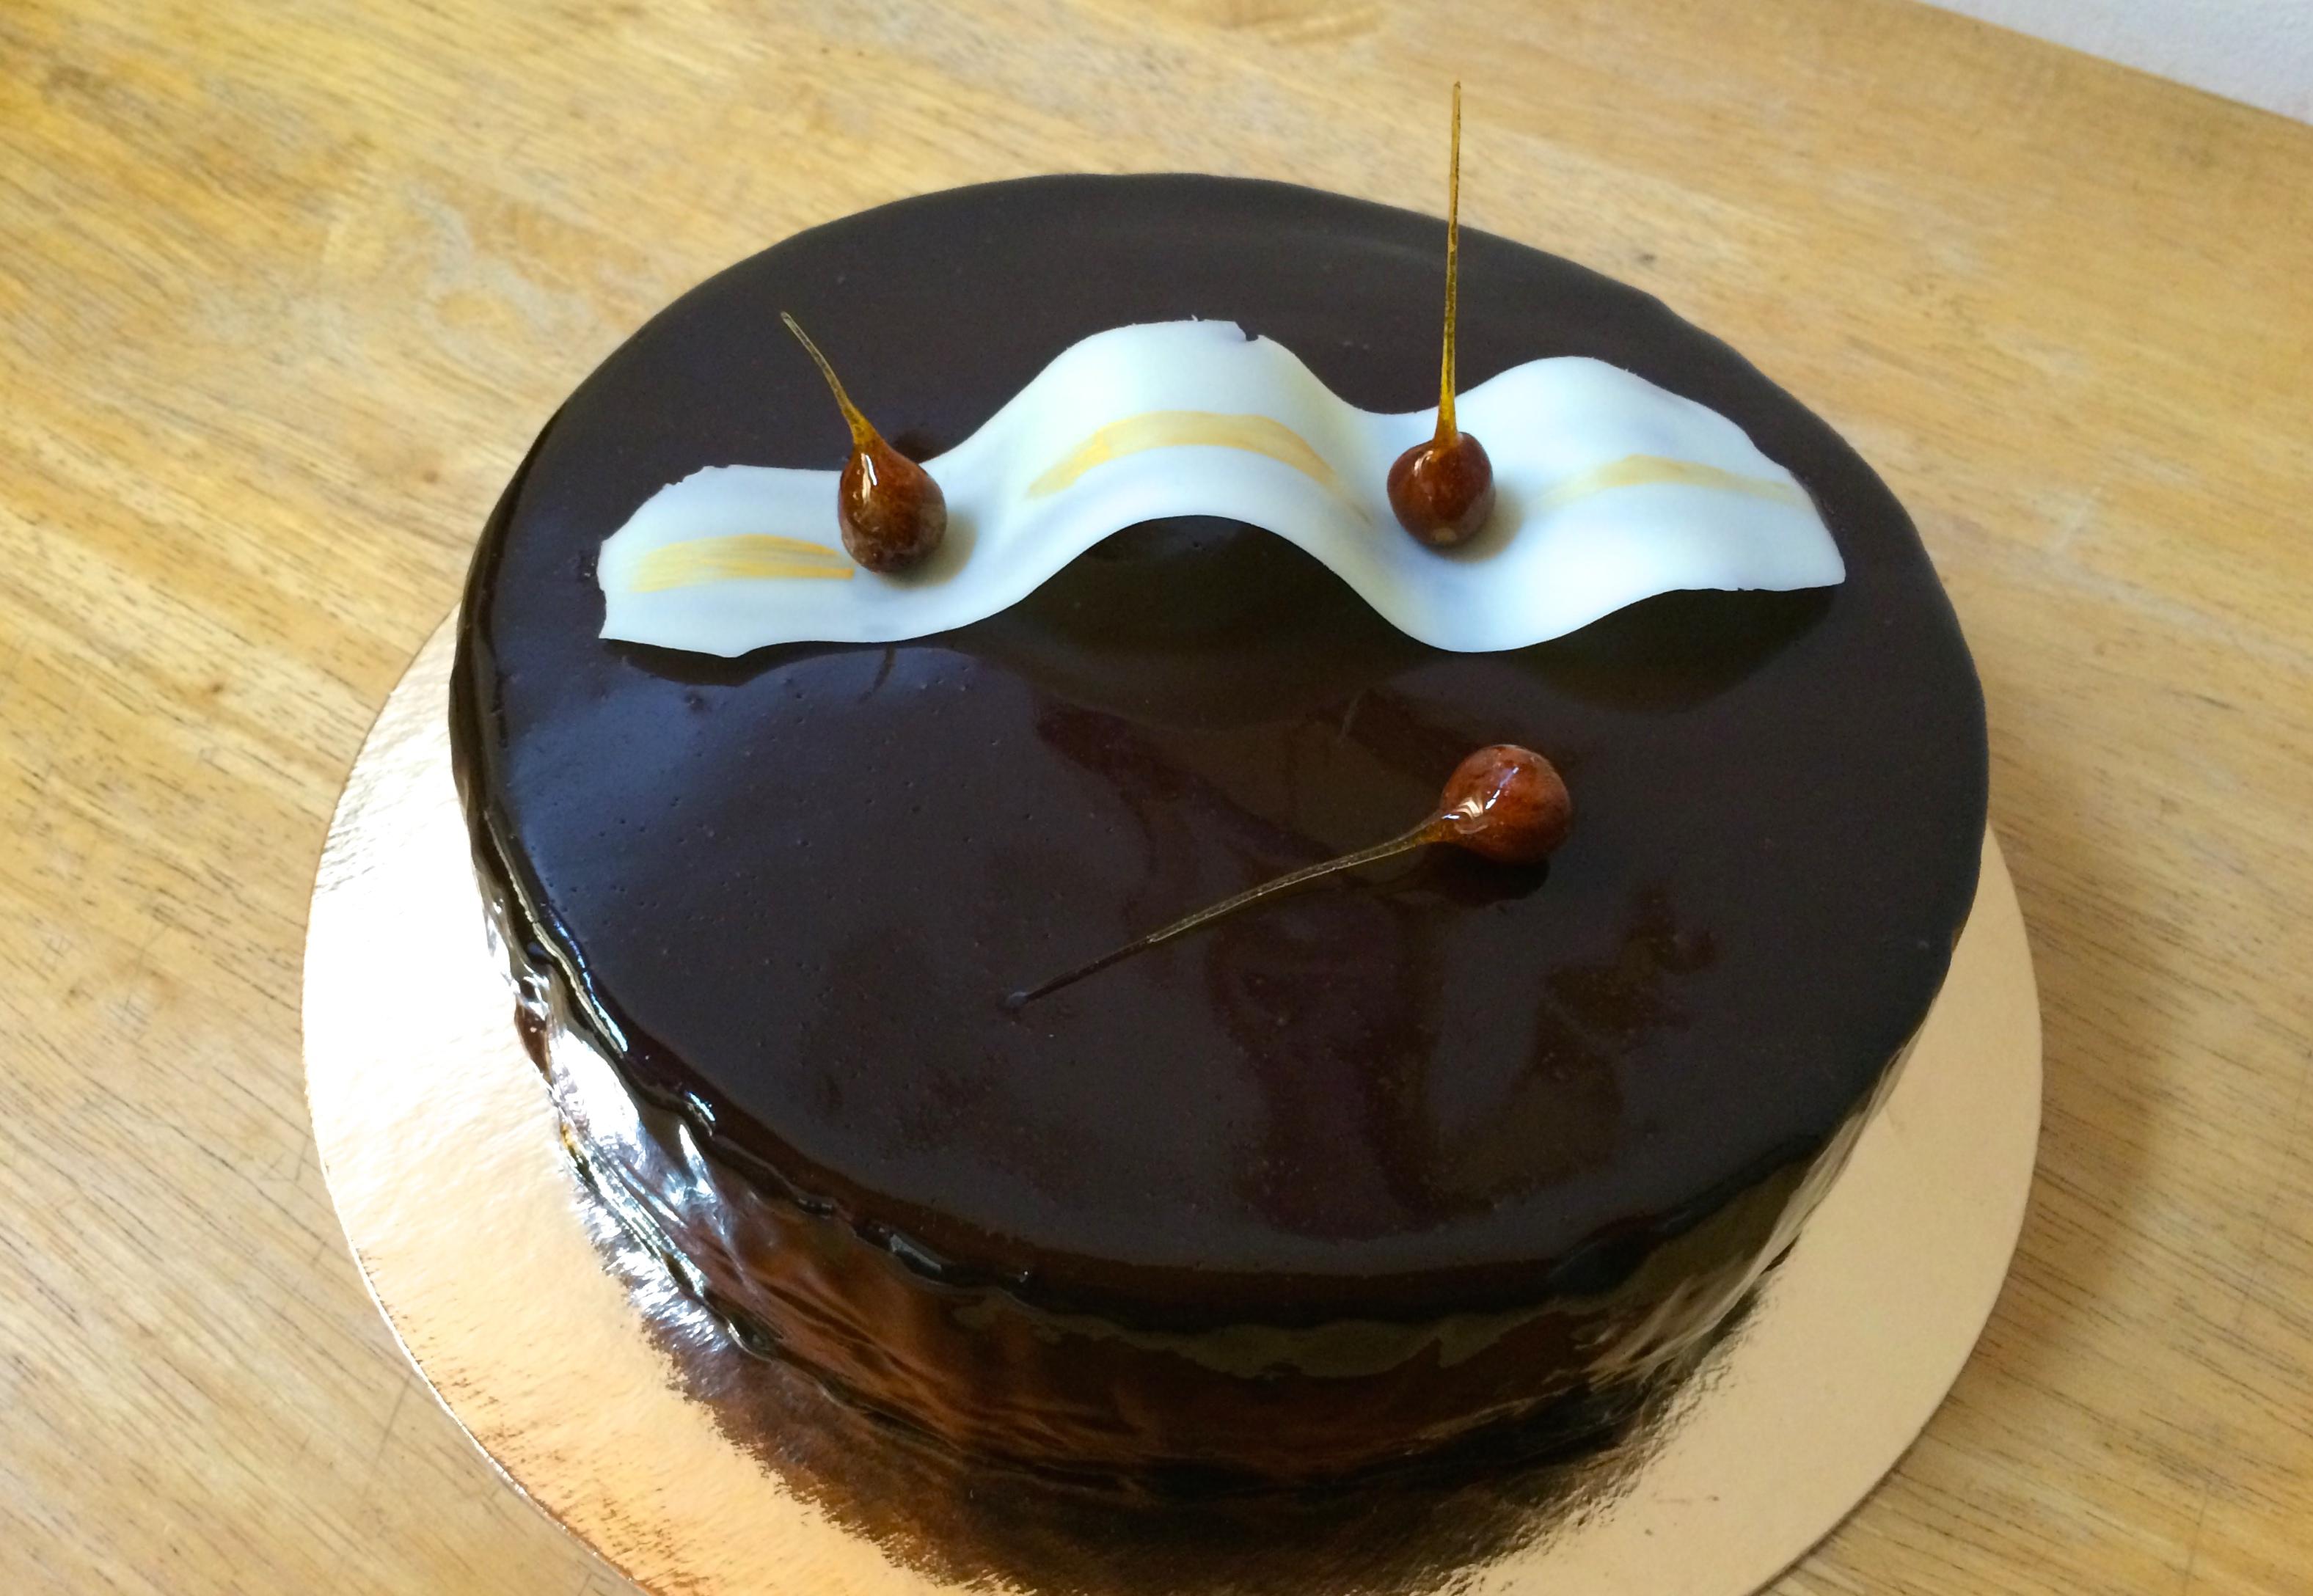 Gla age miroir chocolat sorosebonbons - Glacage pour eclair au chocolat ...